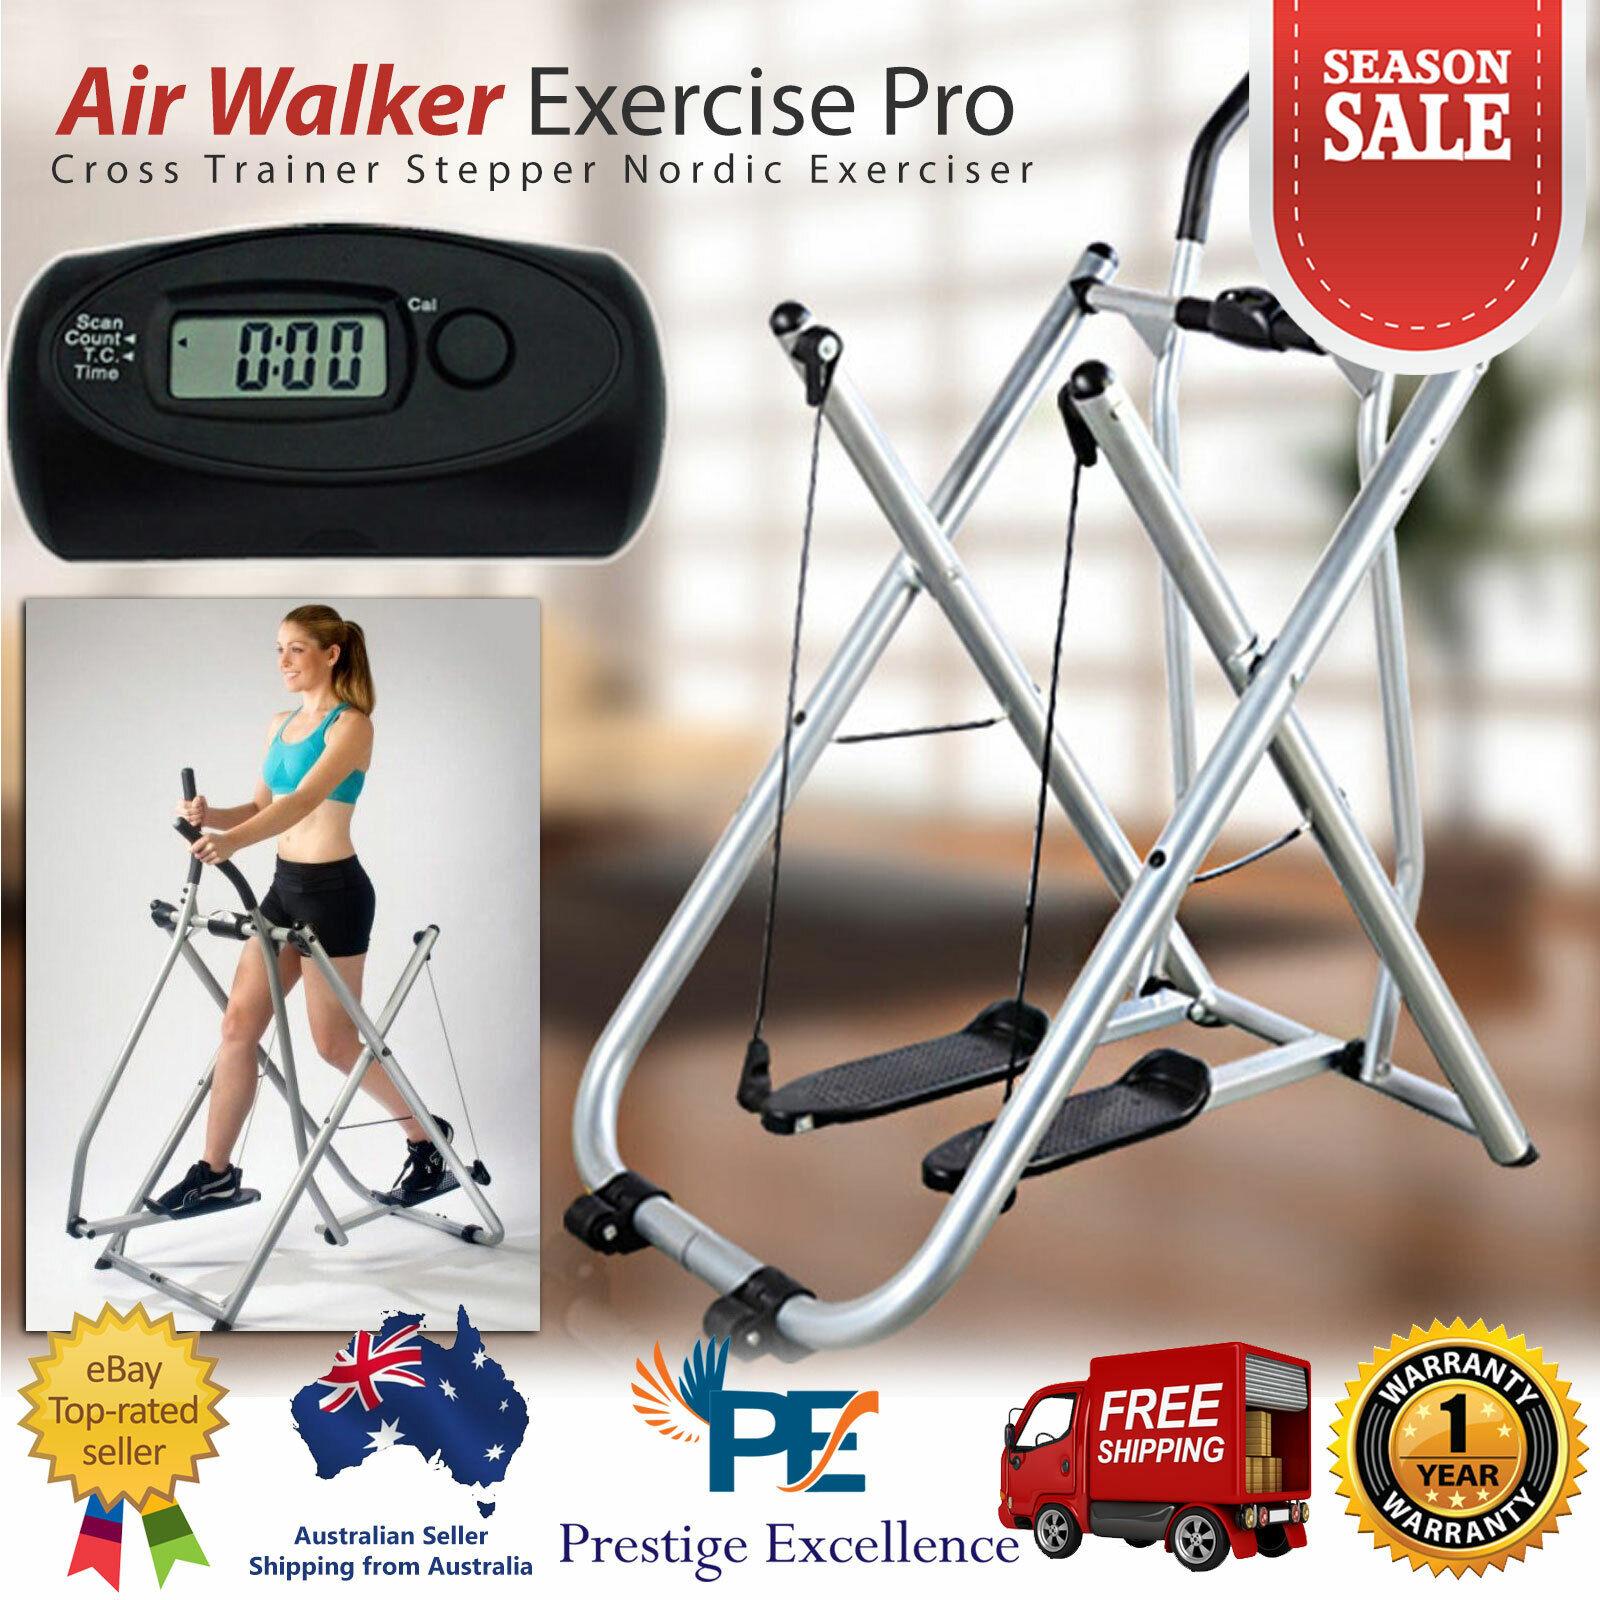 Air Walker Exercise Pro Cross Trainer